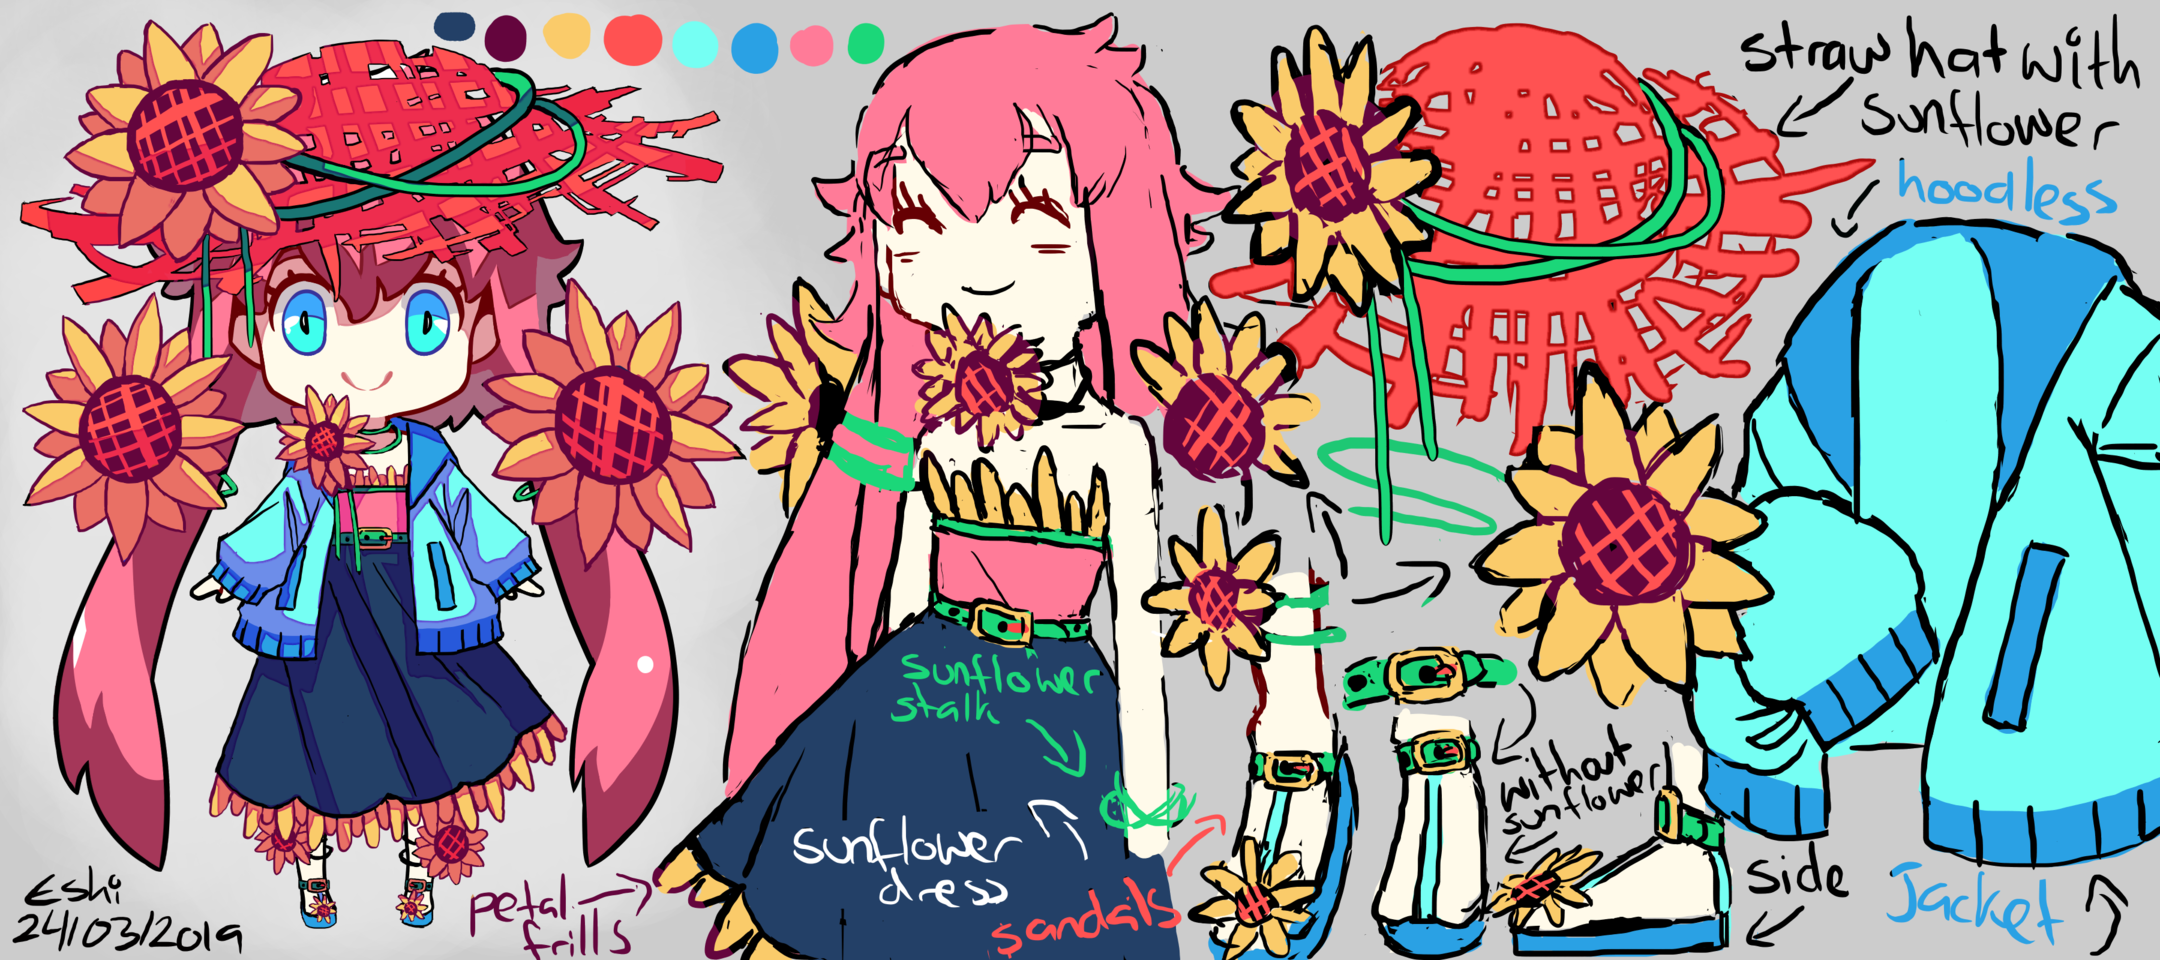 Day 448 Log 554 🌻02 Sunflowers/Eskimo